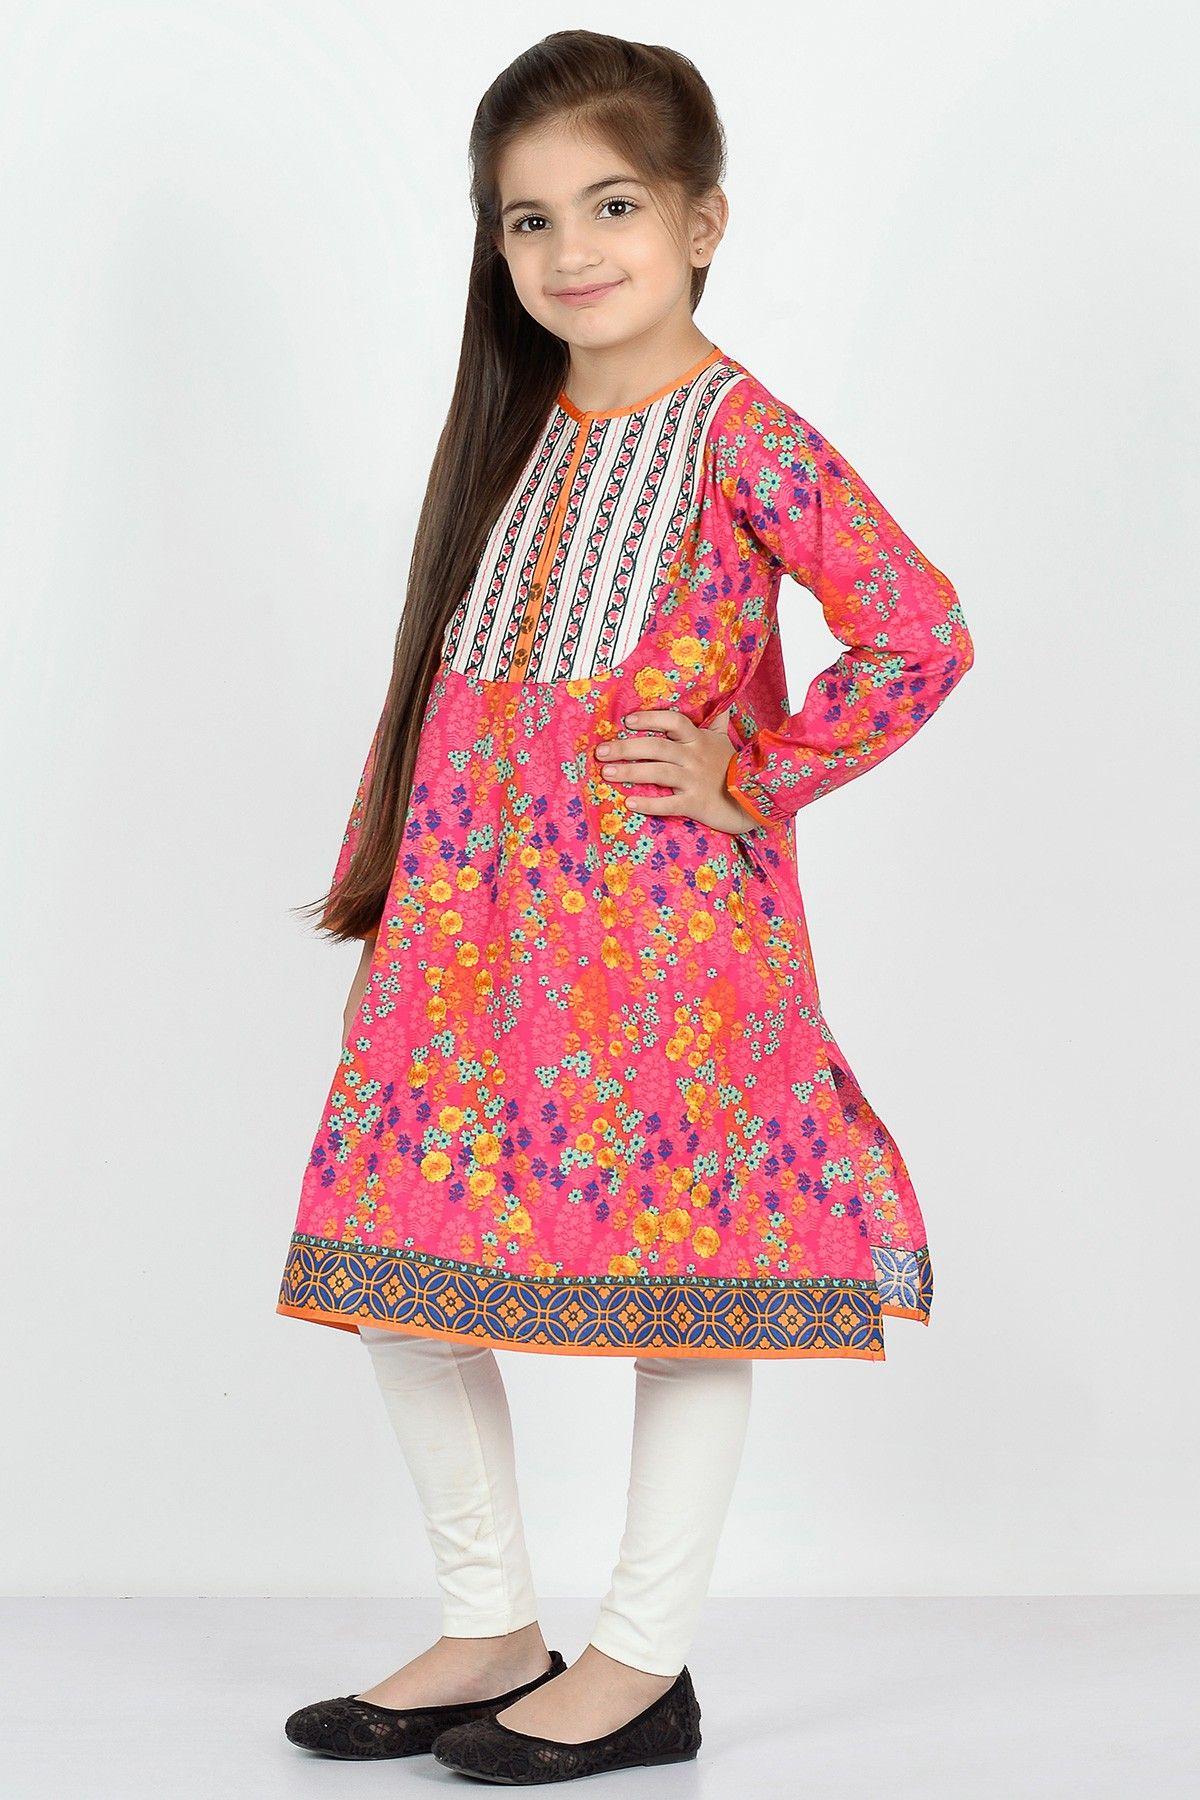 Khaadi - Embroidered Kurta - Kids | Khadi | Pinterest ...